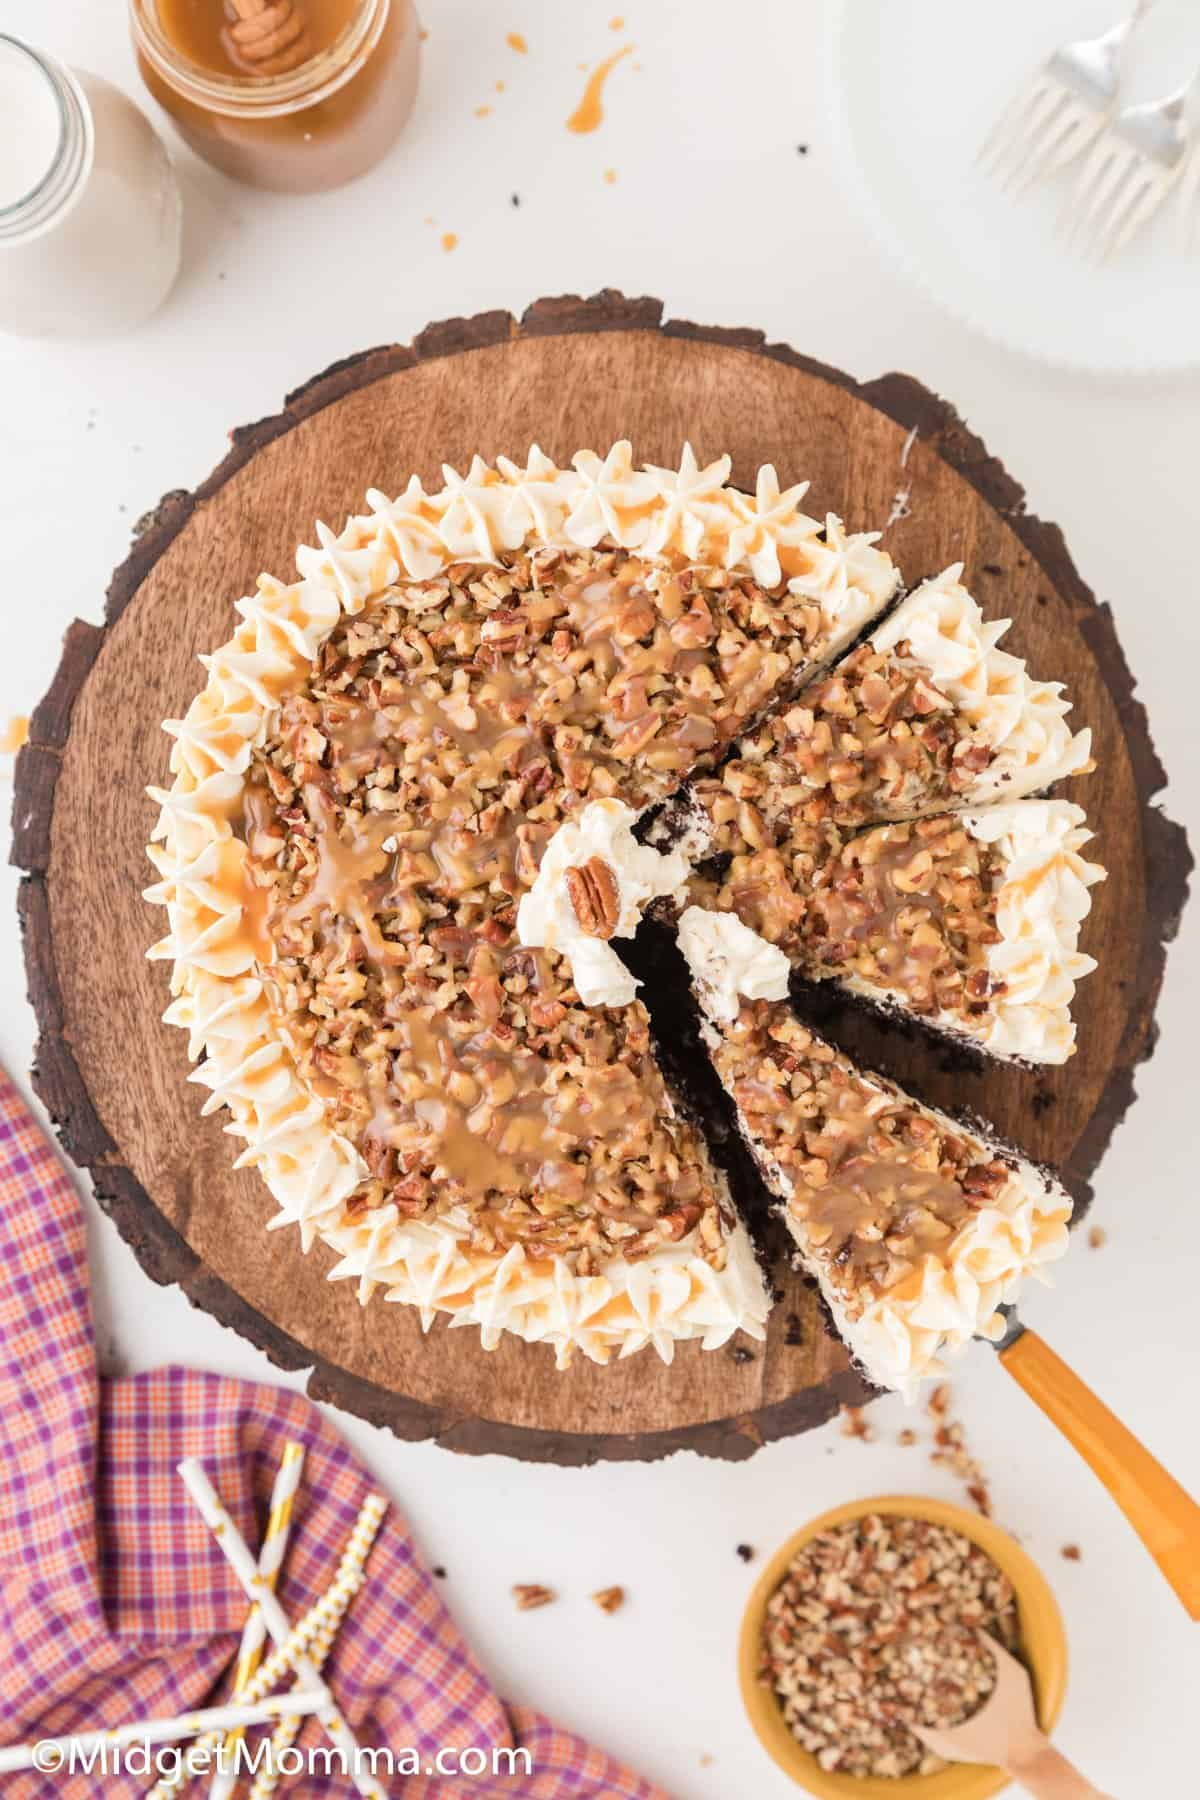 Chocolate Turtle Cake Recipe